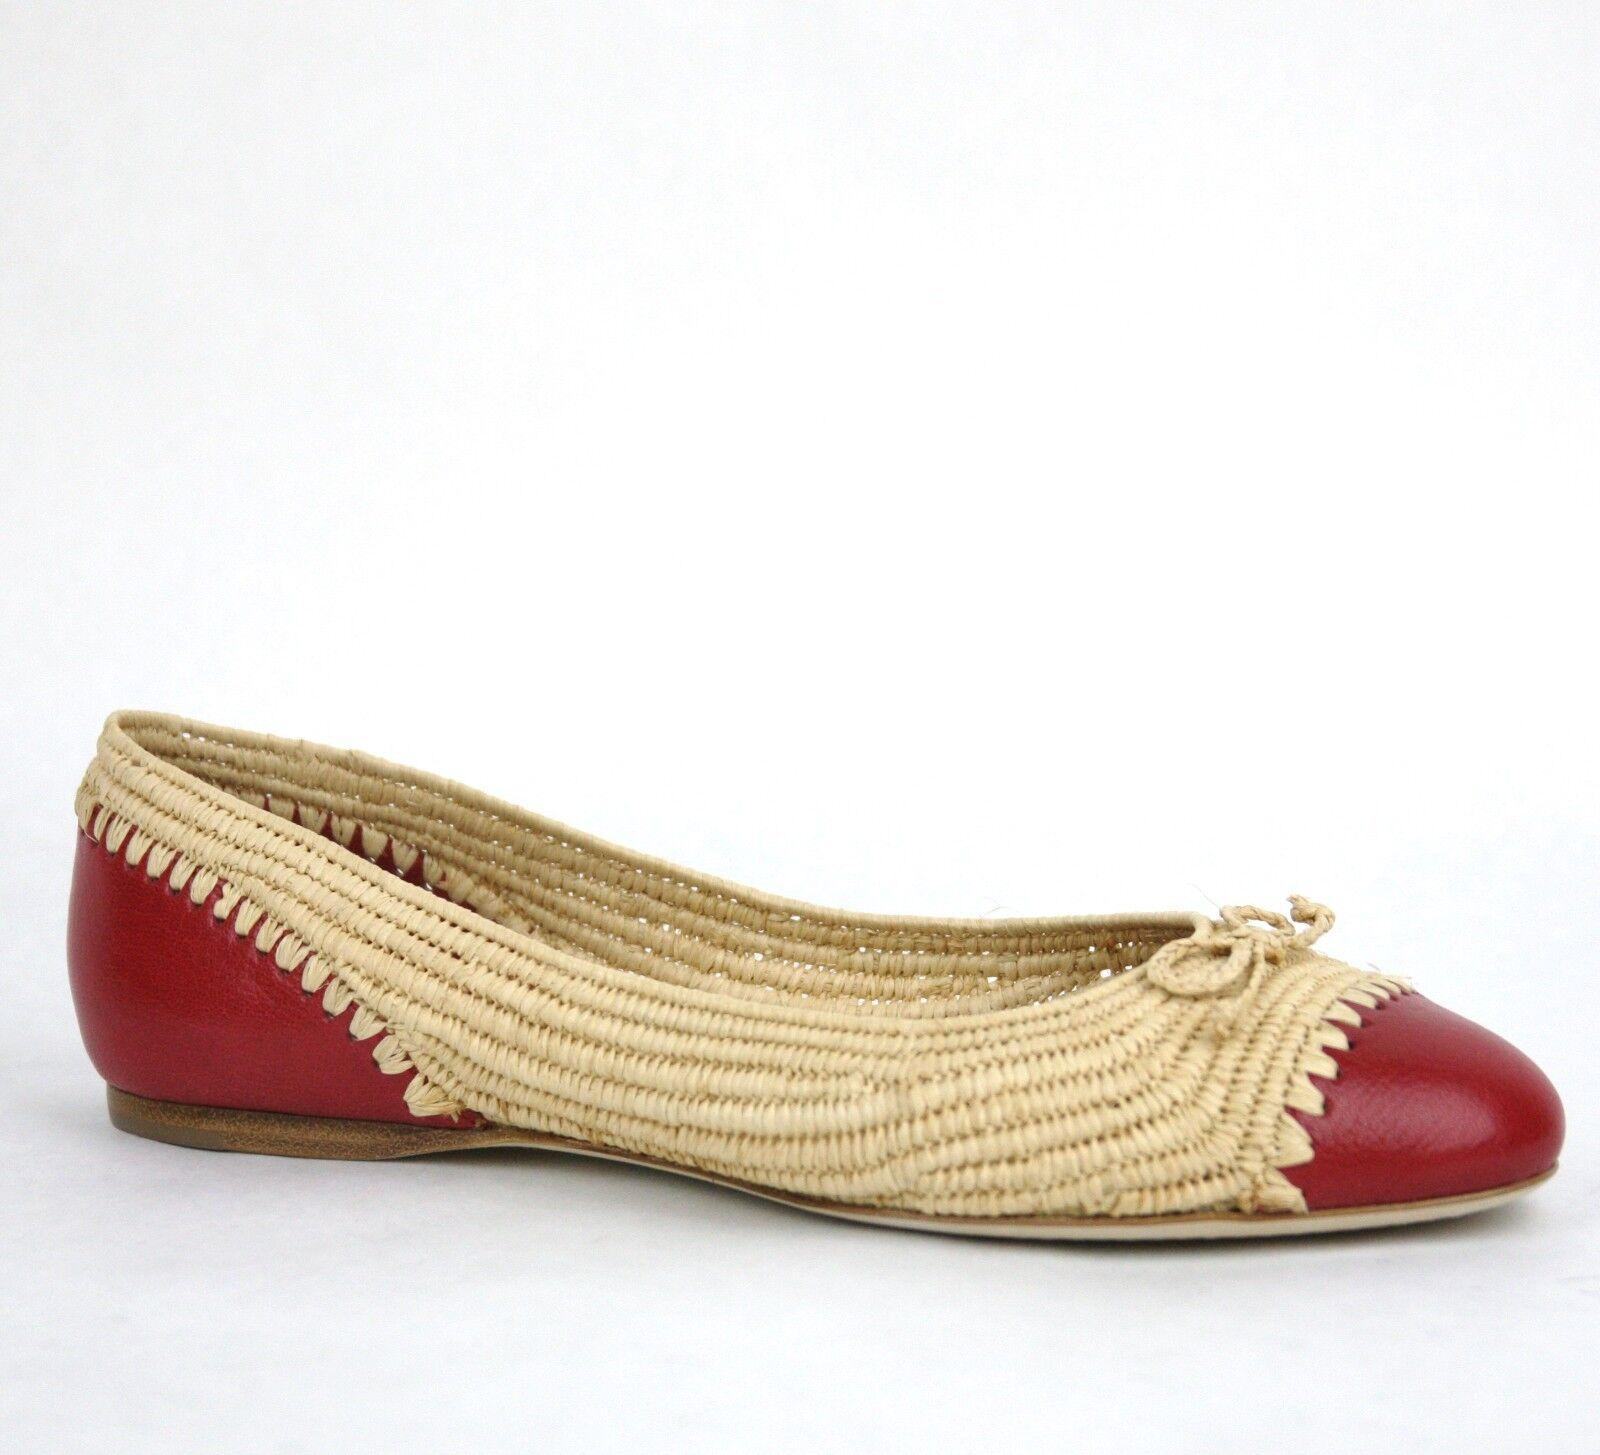 $780 New Bottega Veneta Straw Leather Ballet Flat w/Bow Beige Red 338295 9867